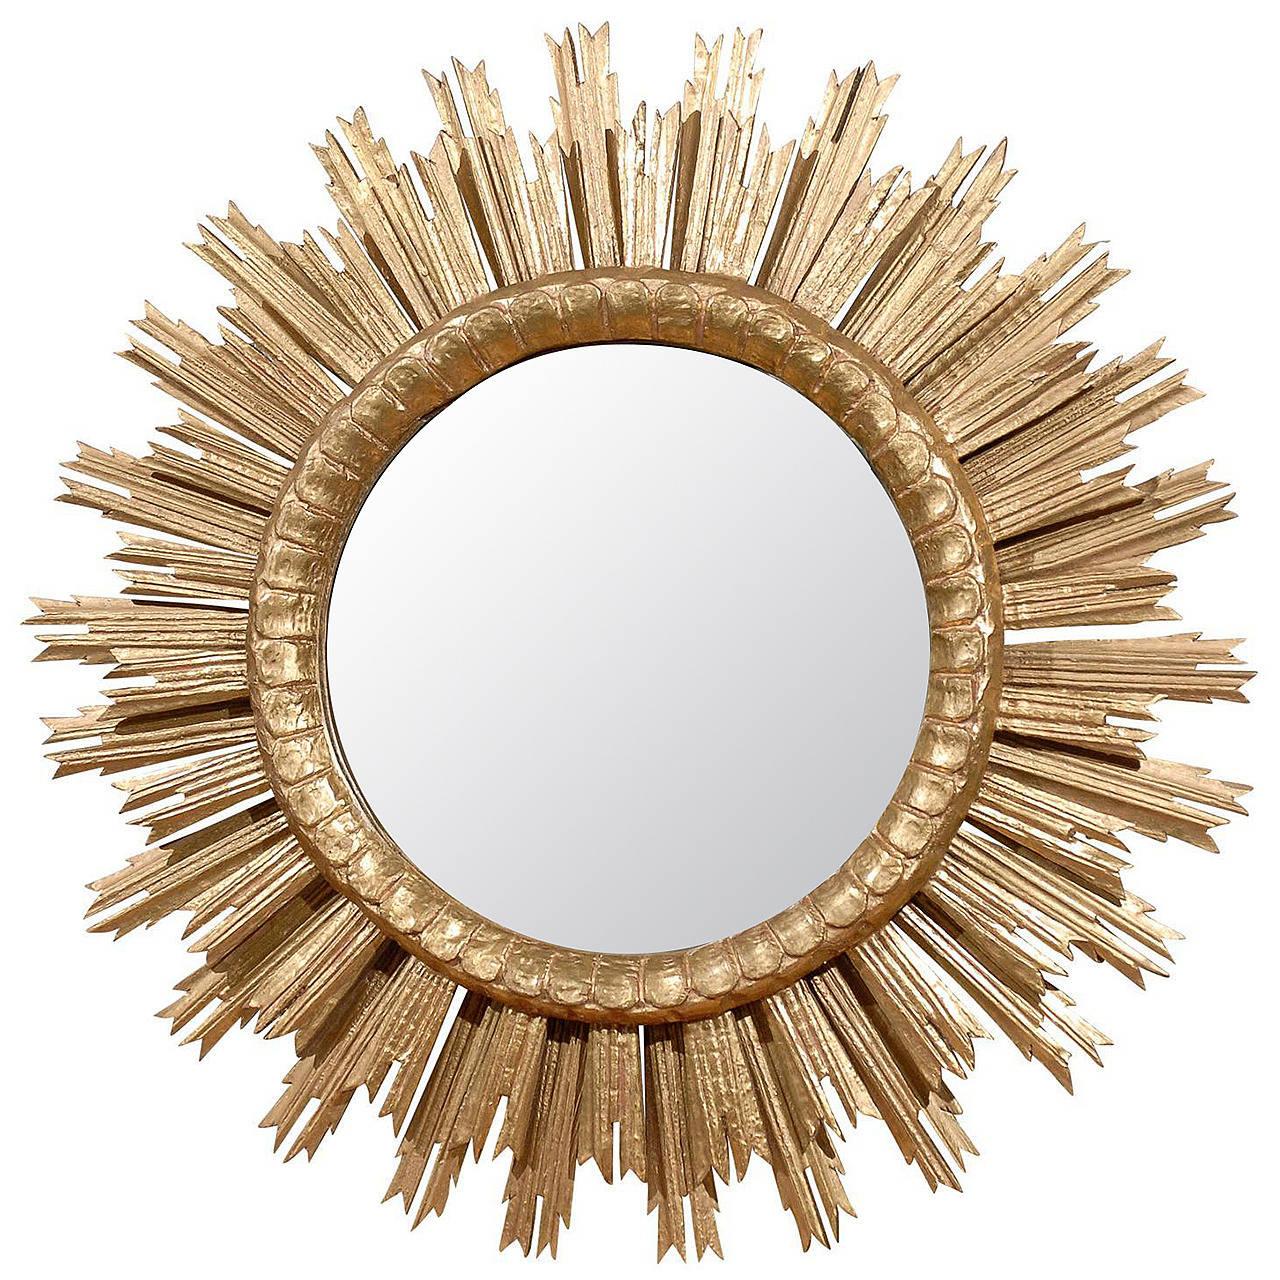 French sunburst mirror at 1stdibs for Sunburst mirror